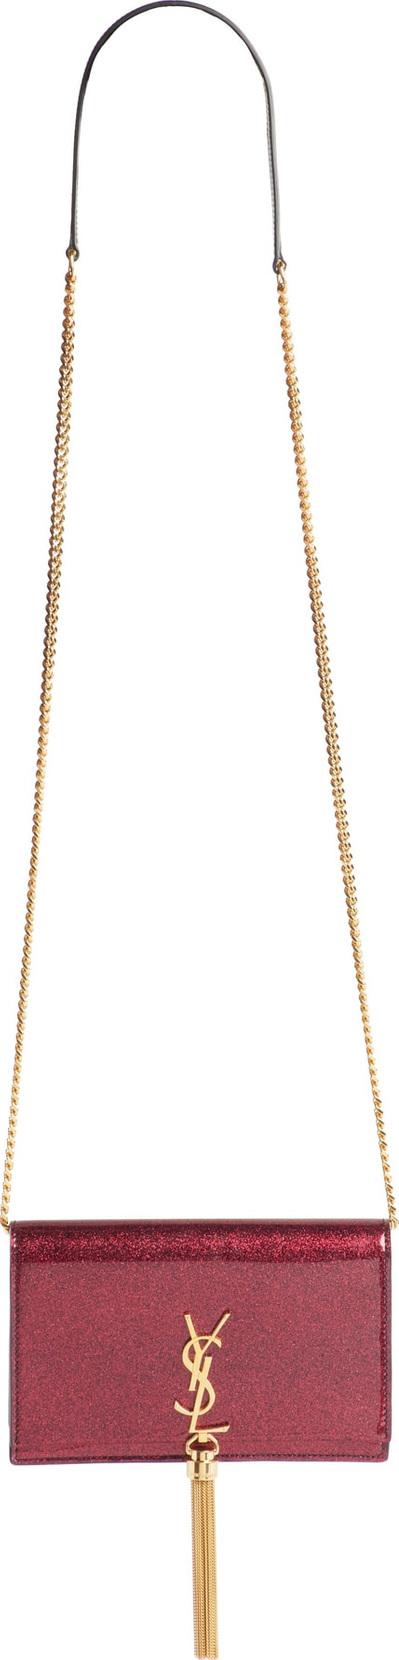 Saint Laurent Kate Glitter Wallet on a Chain